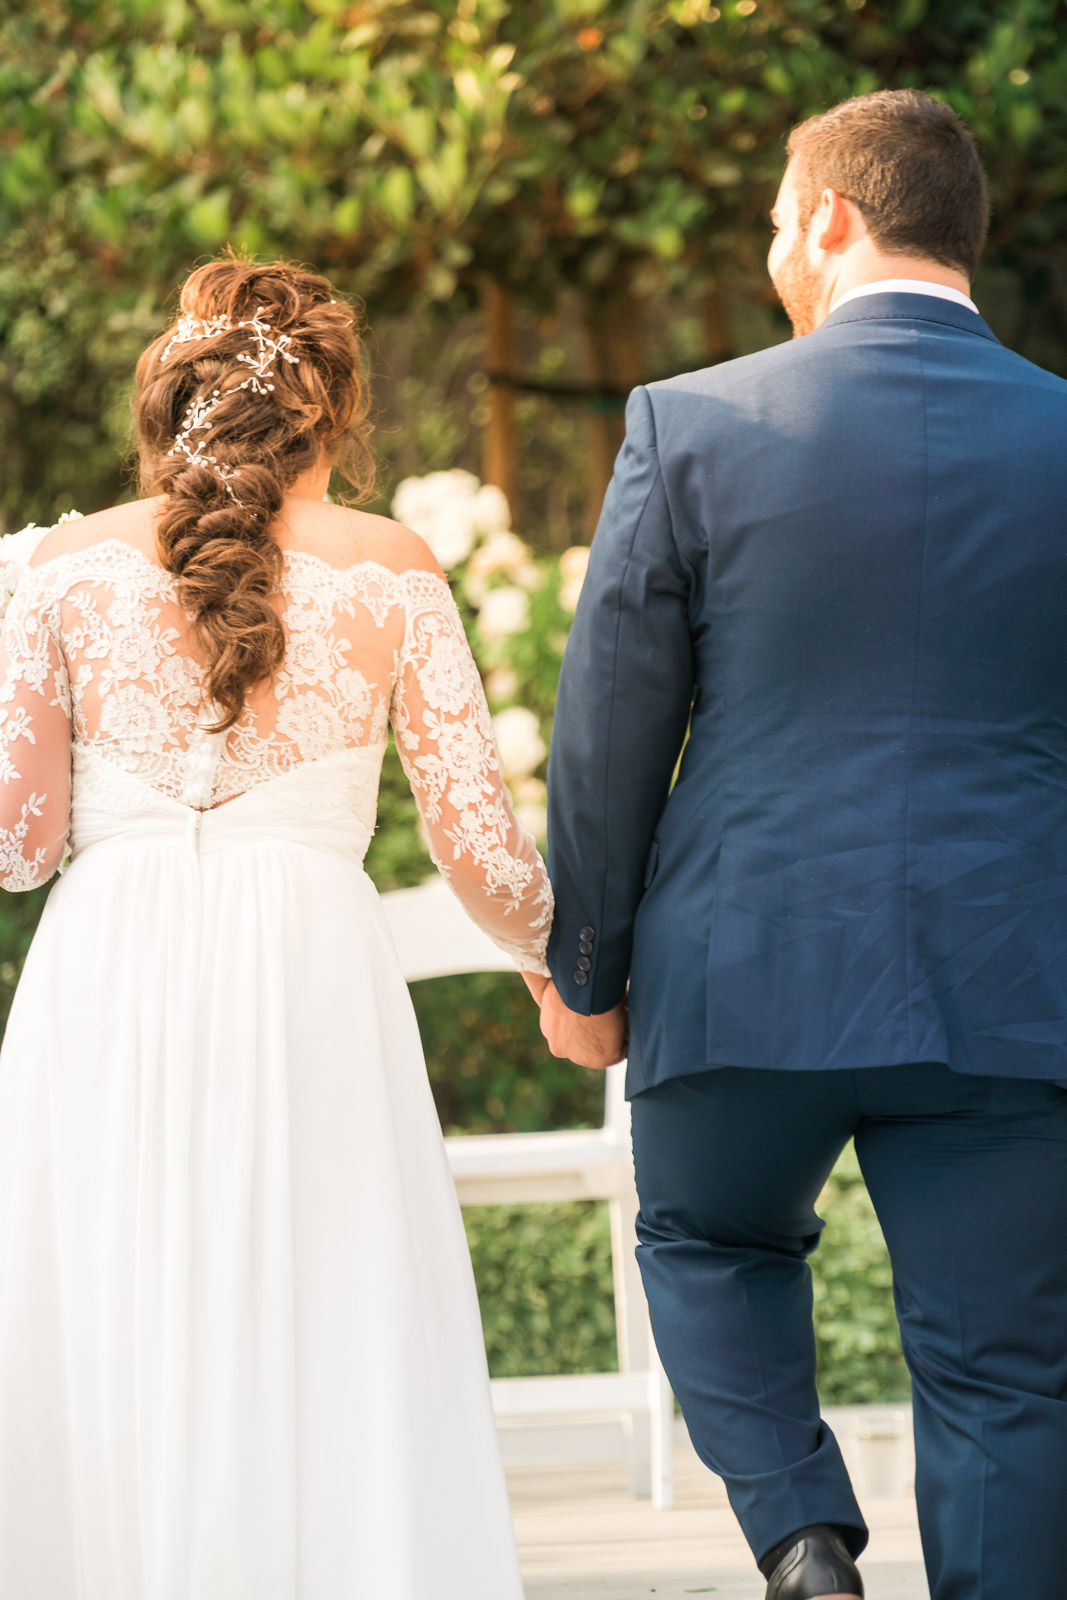 159_Angel-Brea-Orange-County_Joseph-Barber-Wedding-Photography.jpg